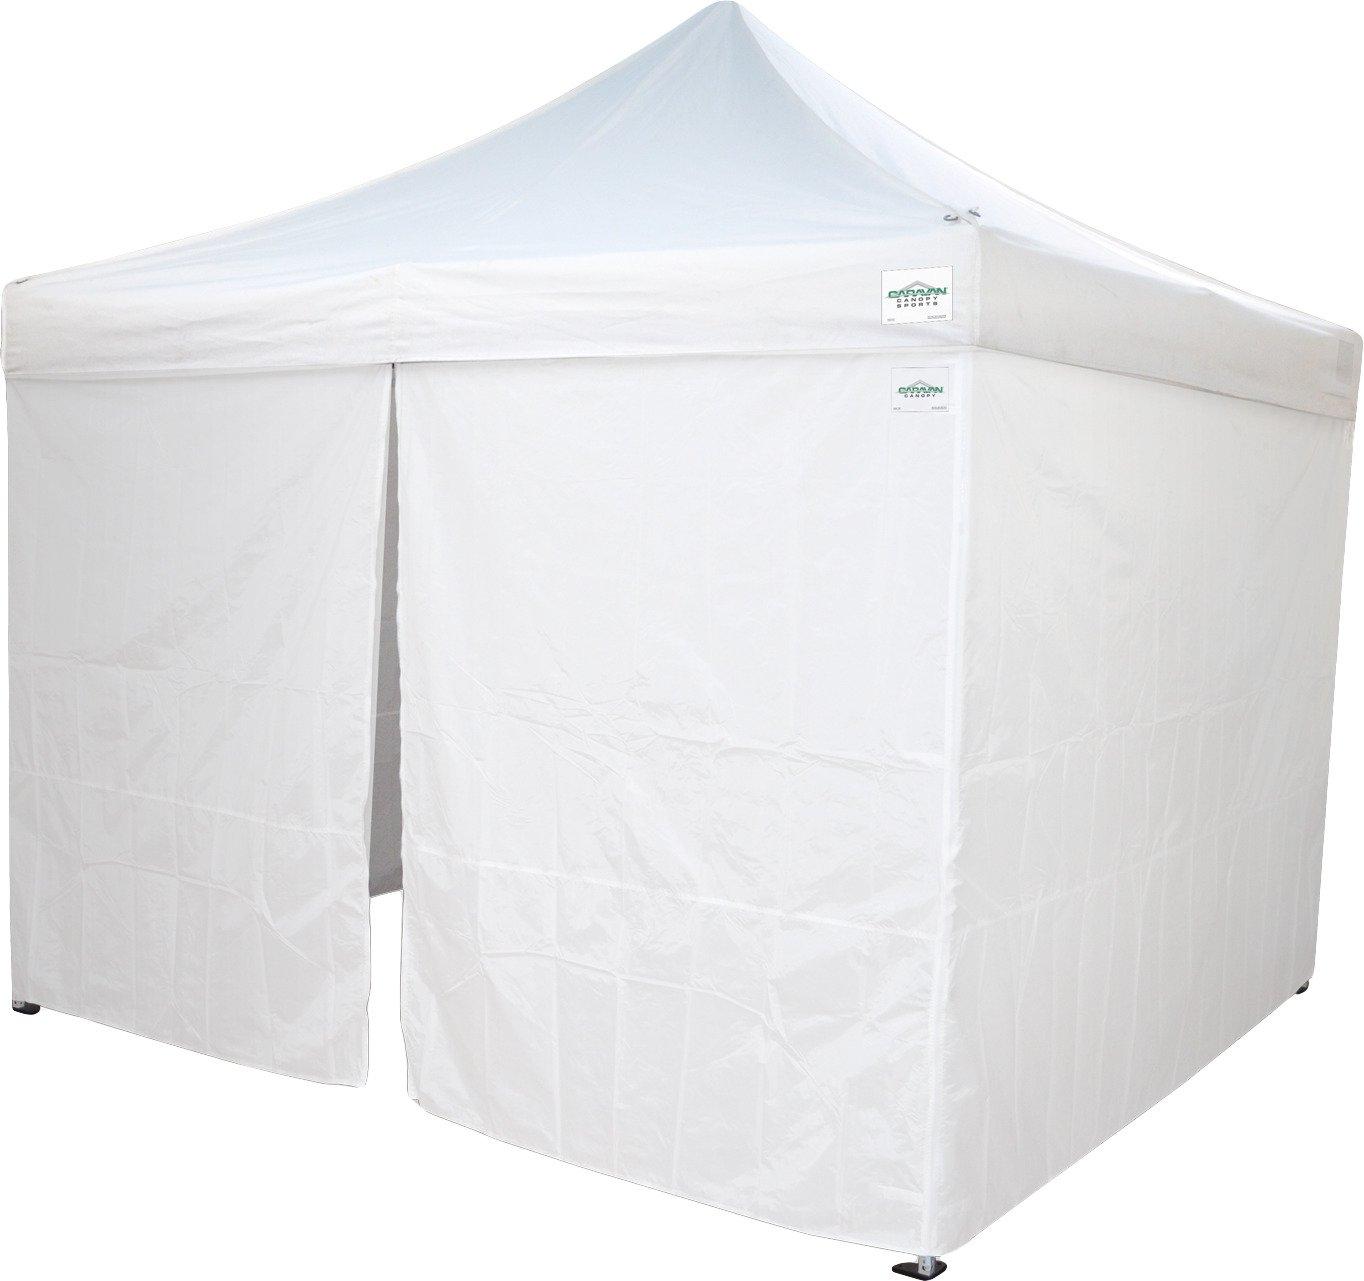 Caravan® Canopy Sports 12' x 12' M-Series Pro